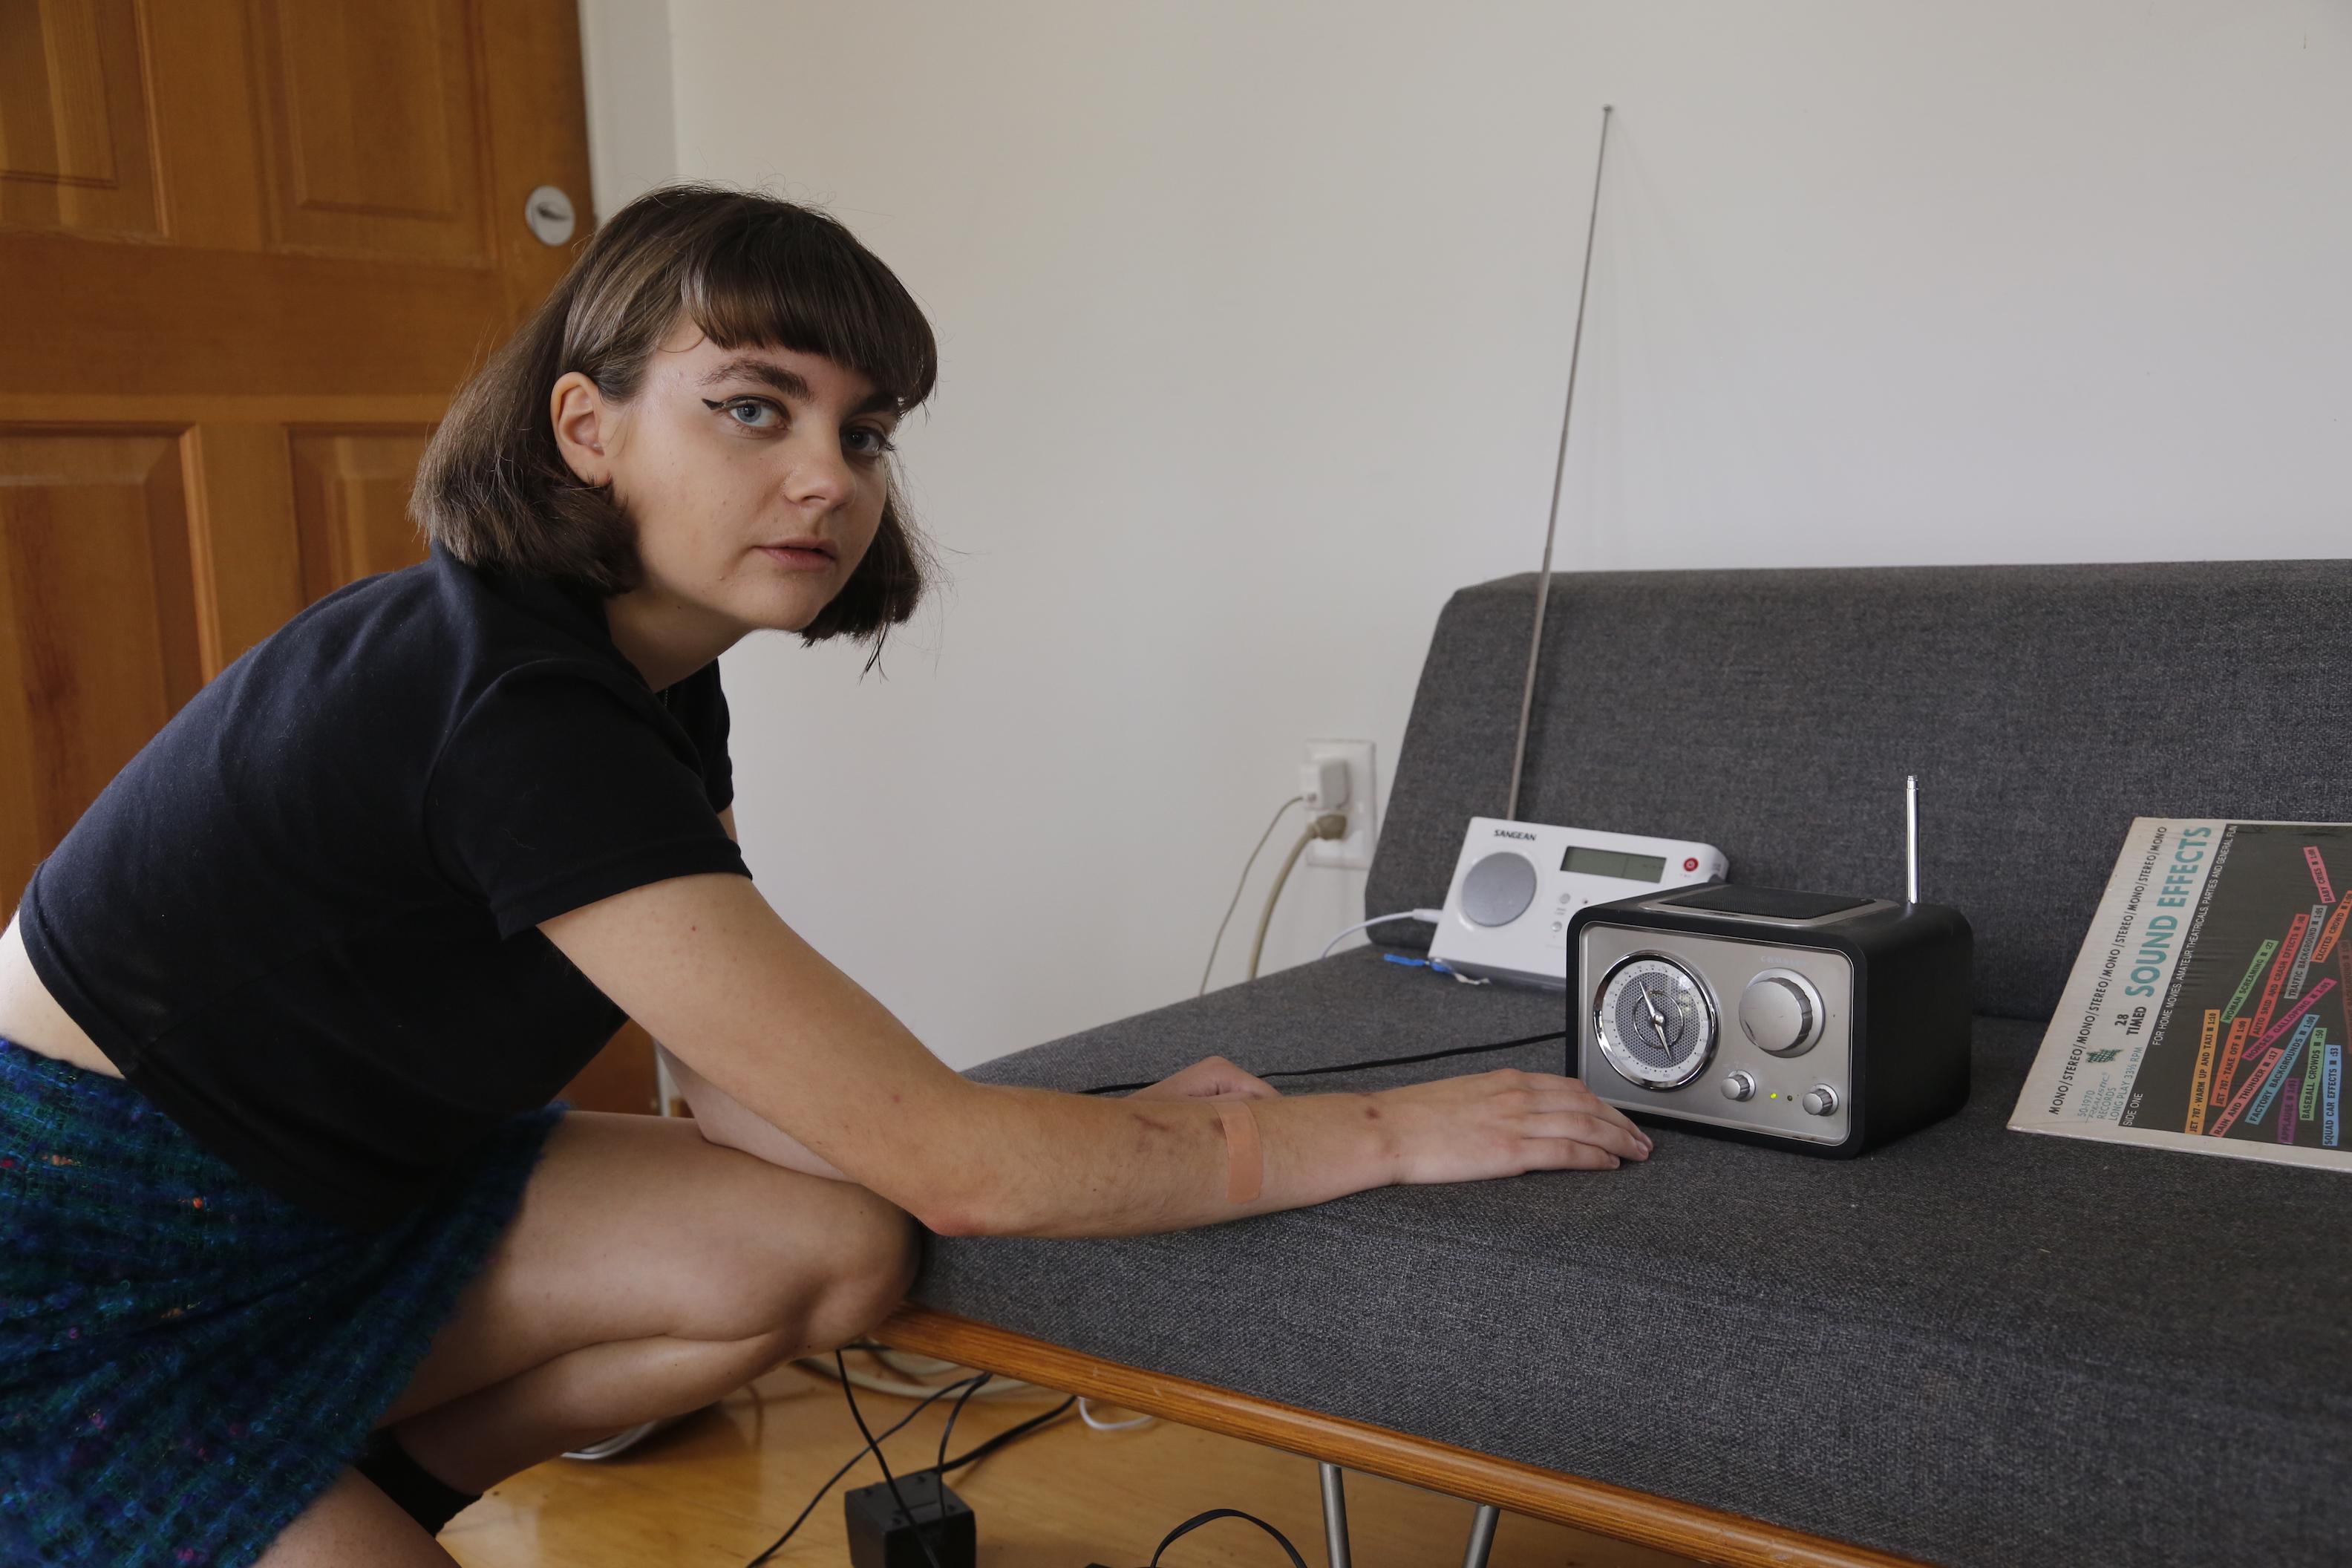 Clara Lou With Radios: Image 2